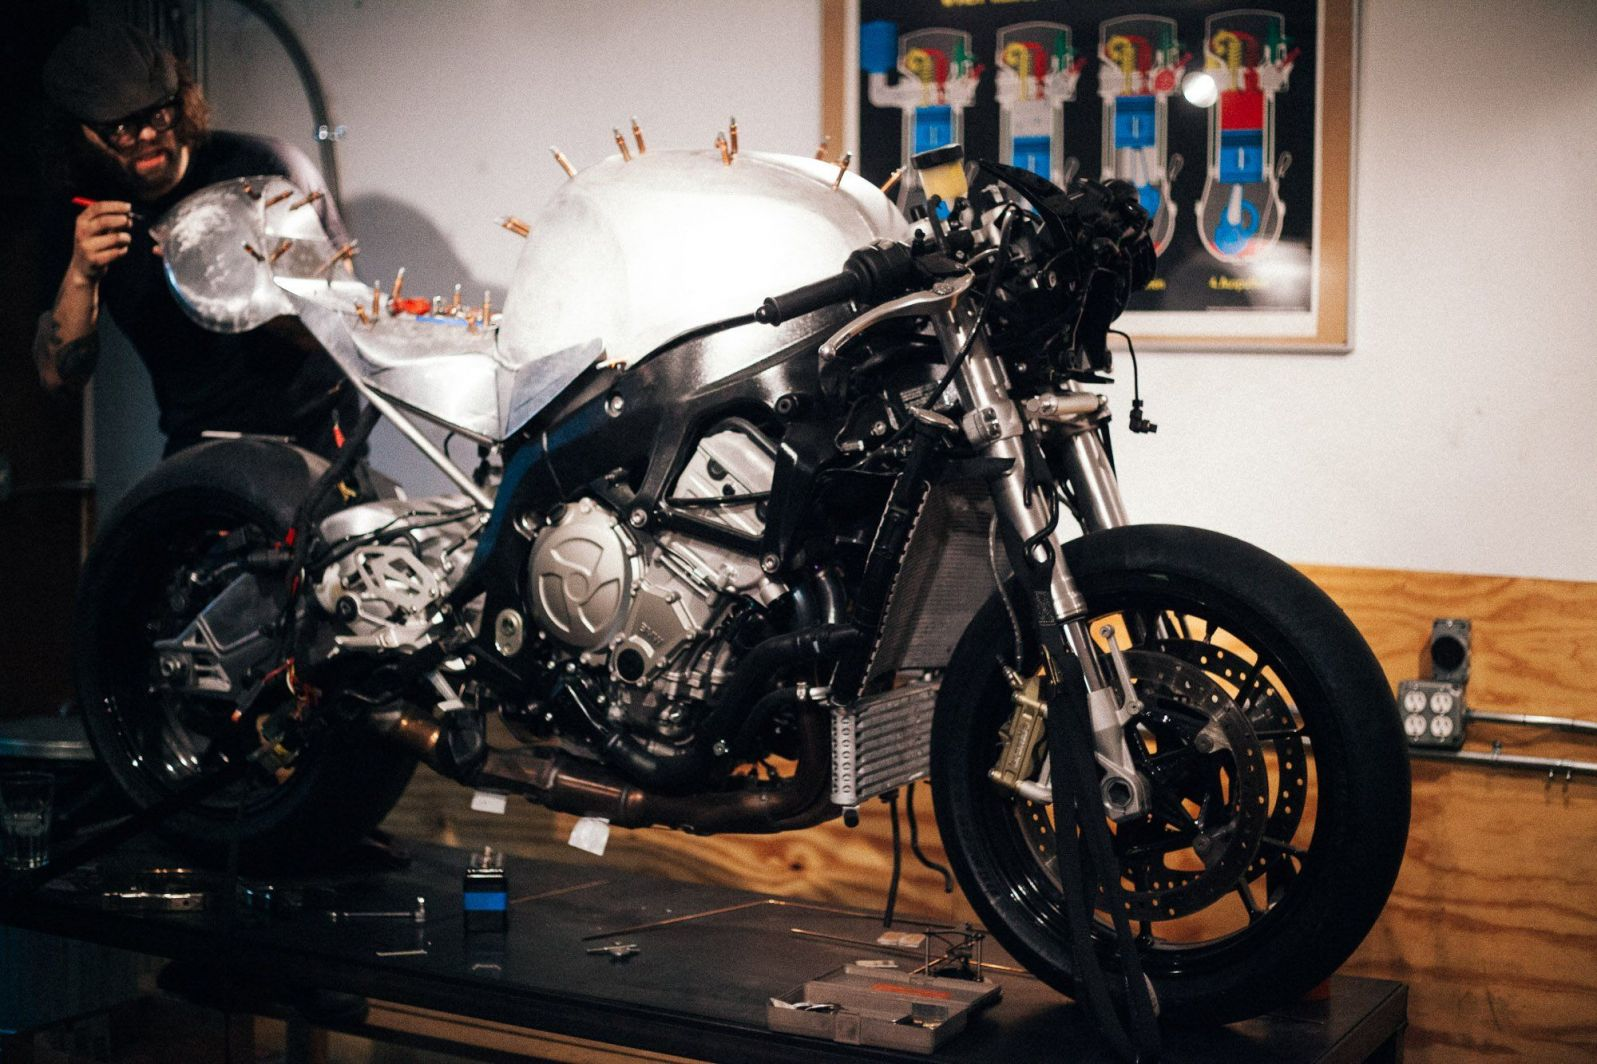 Revival S1000RR